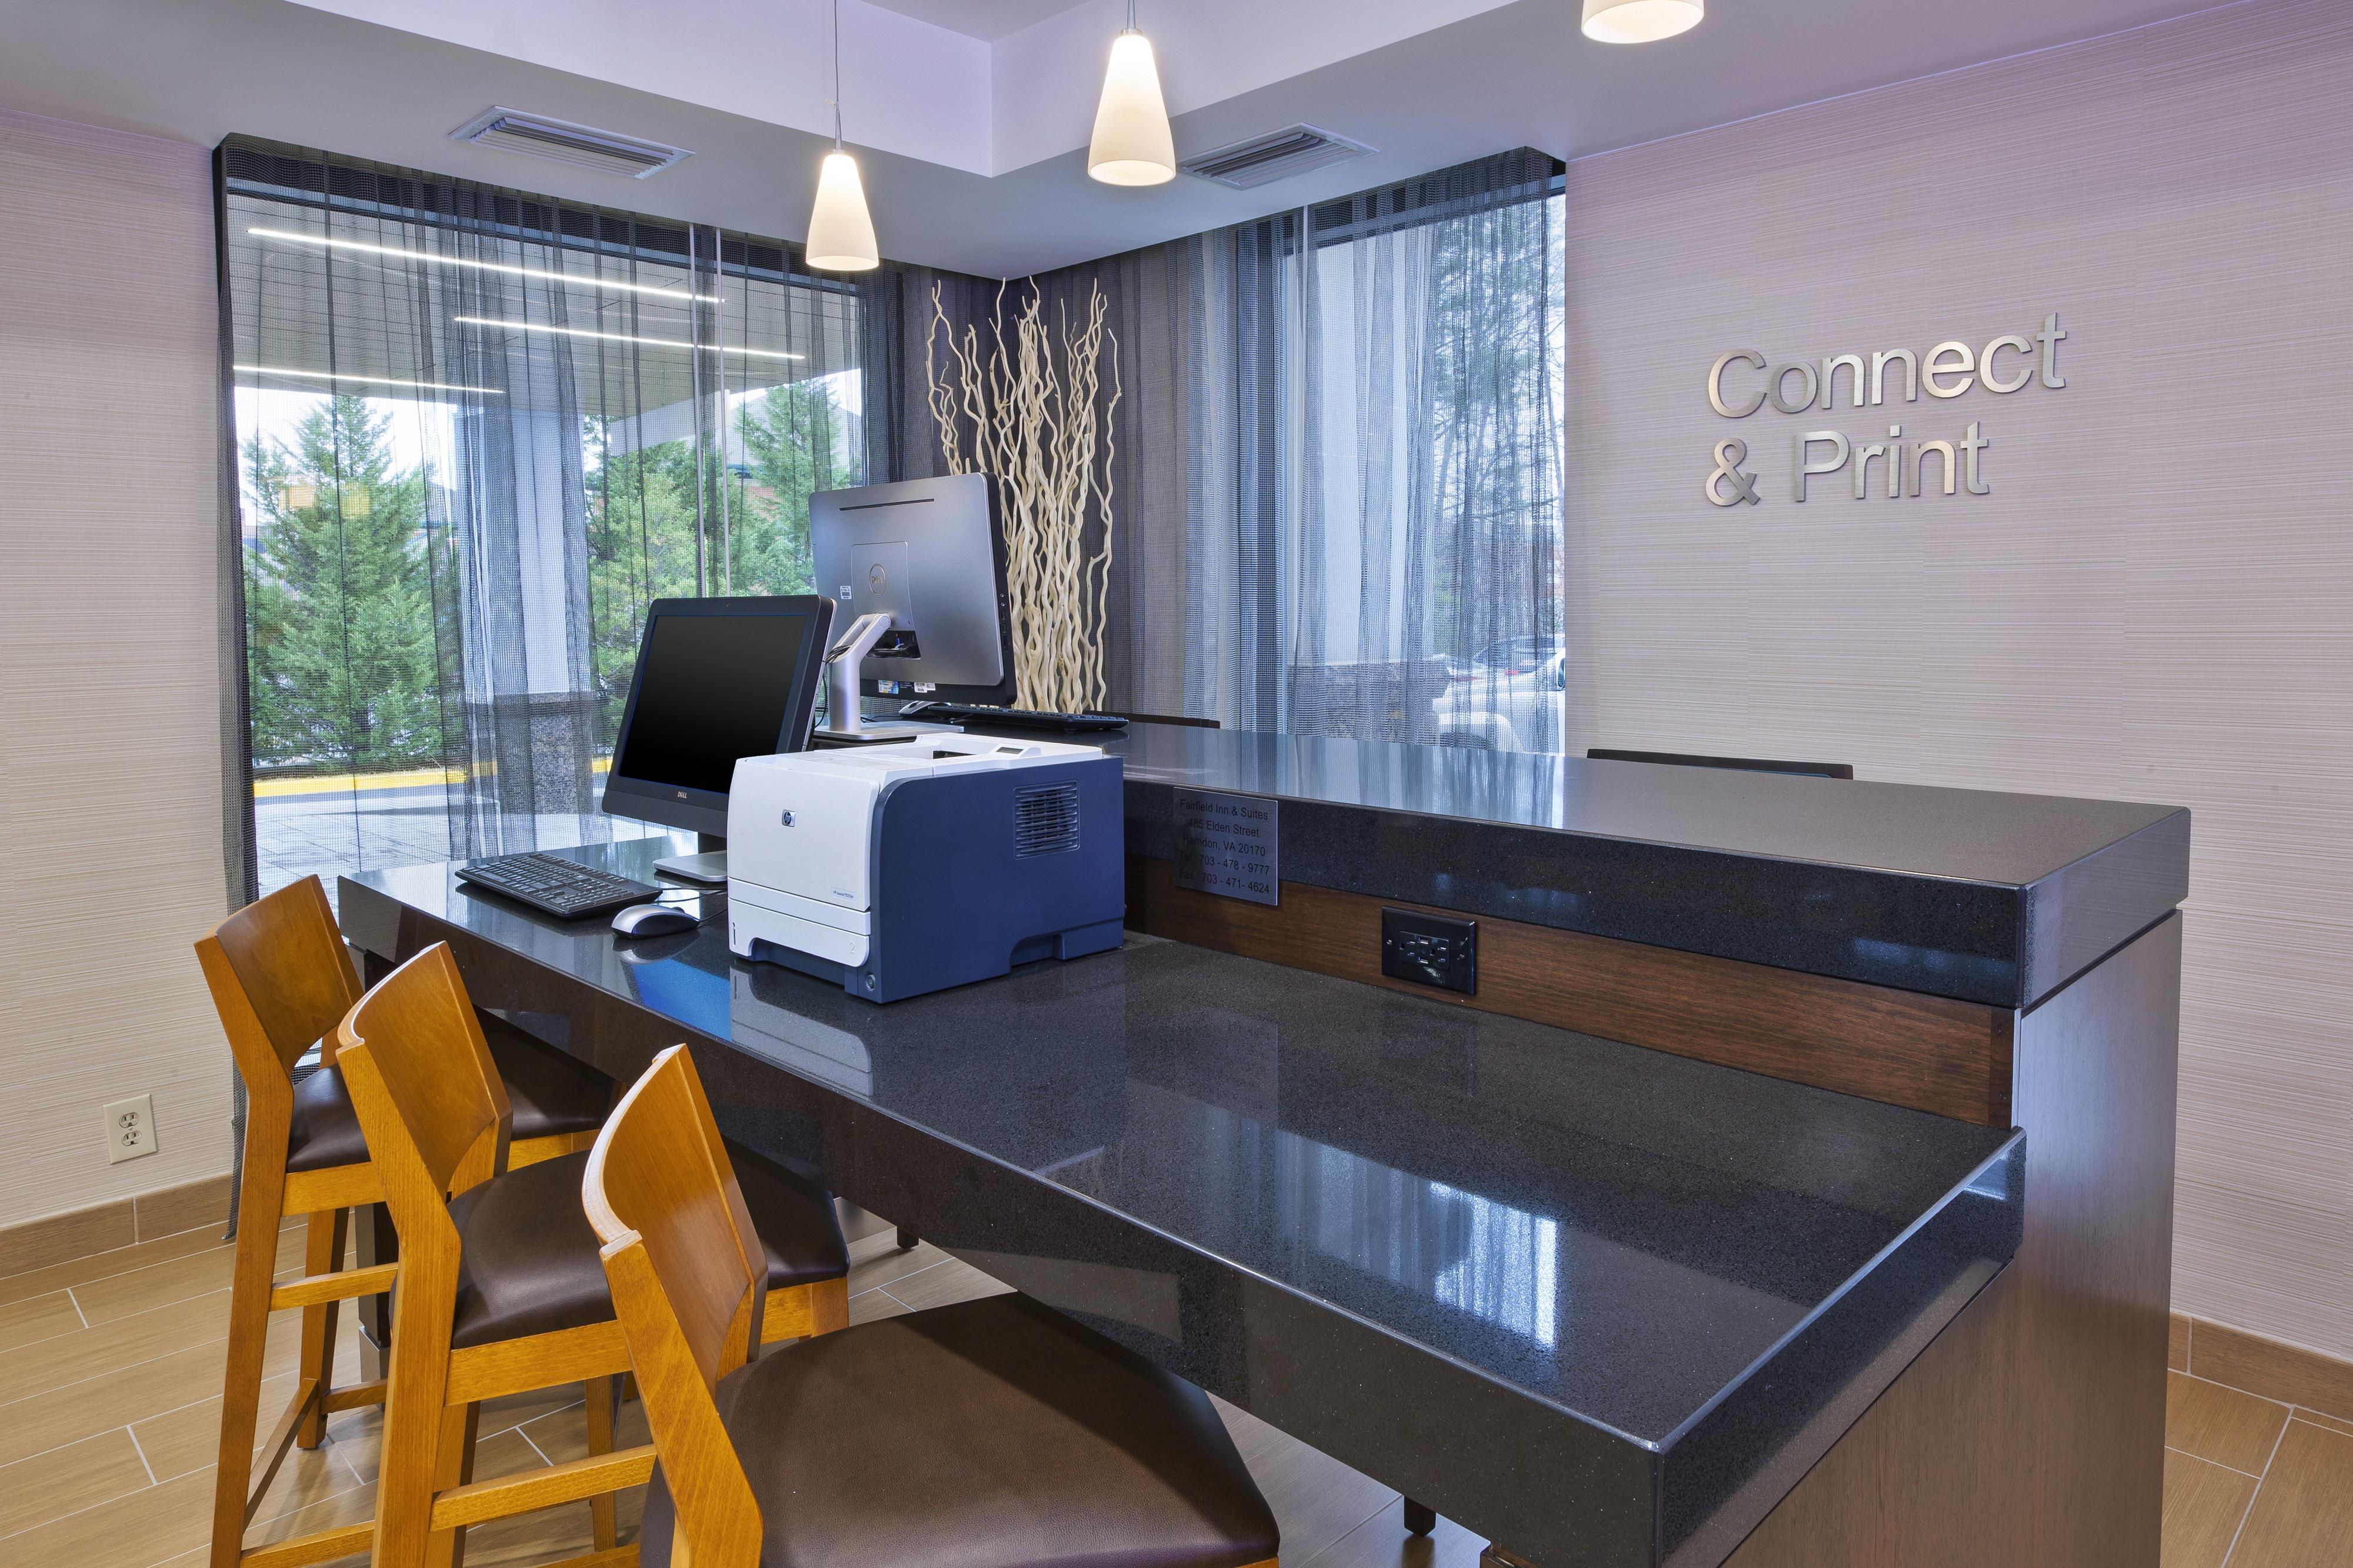 Fairfield Inn & Suites by Marriott Dulles Airport Herndon/Reston image 7